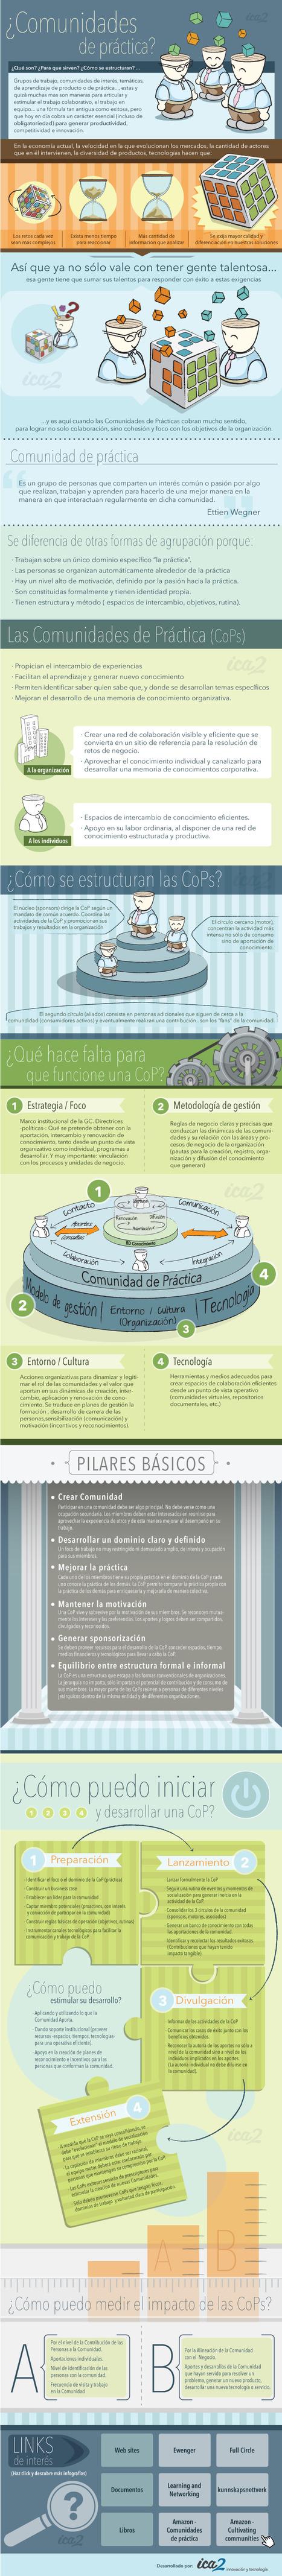 Educación tecnológica: ¿Comunidades de prácticas en Educación? | A New Society, a new education! | Scoop.it